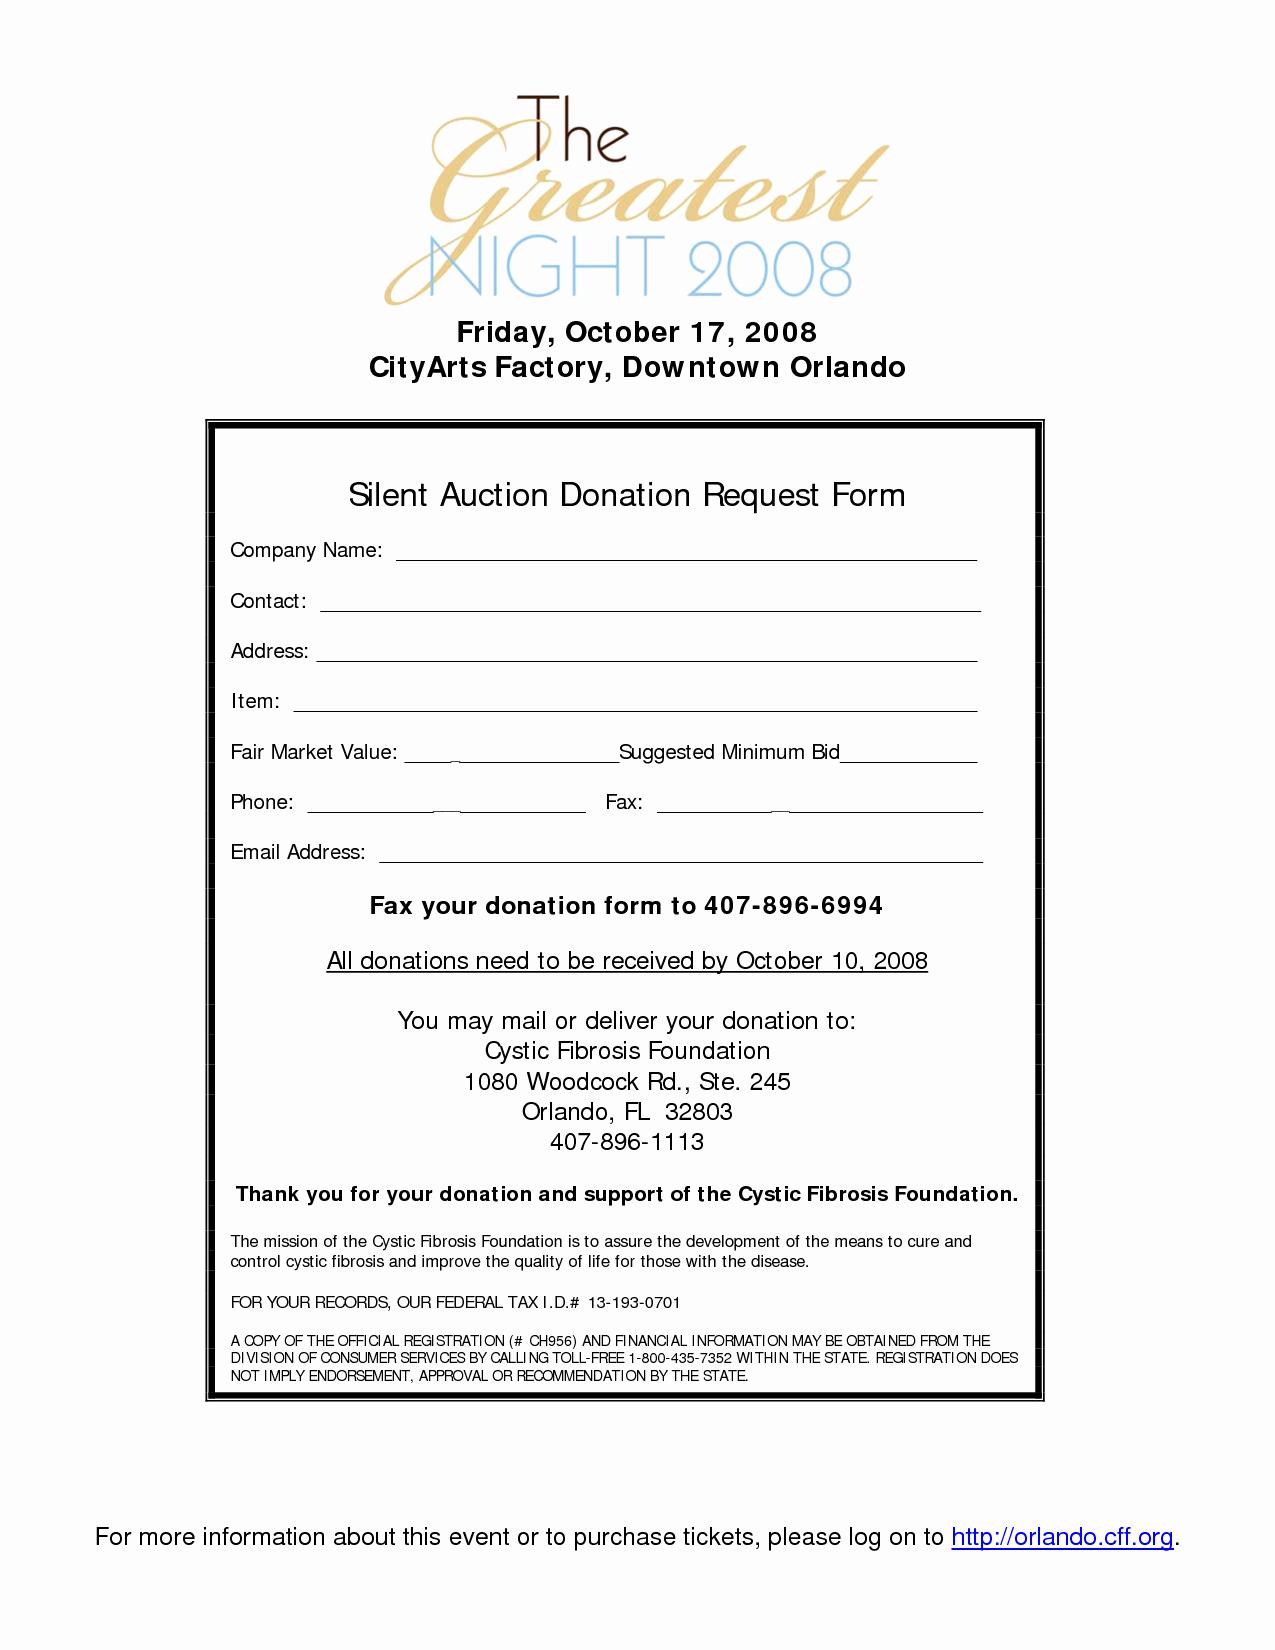 Silent Auction Donation Letter Template Beautiful Silent Auction Donation form Template